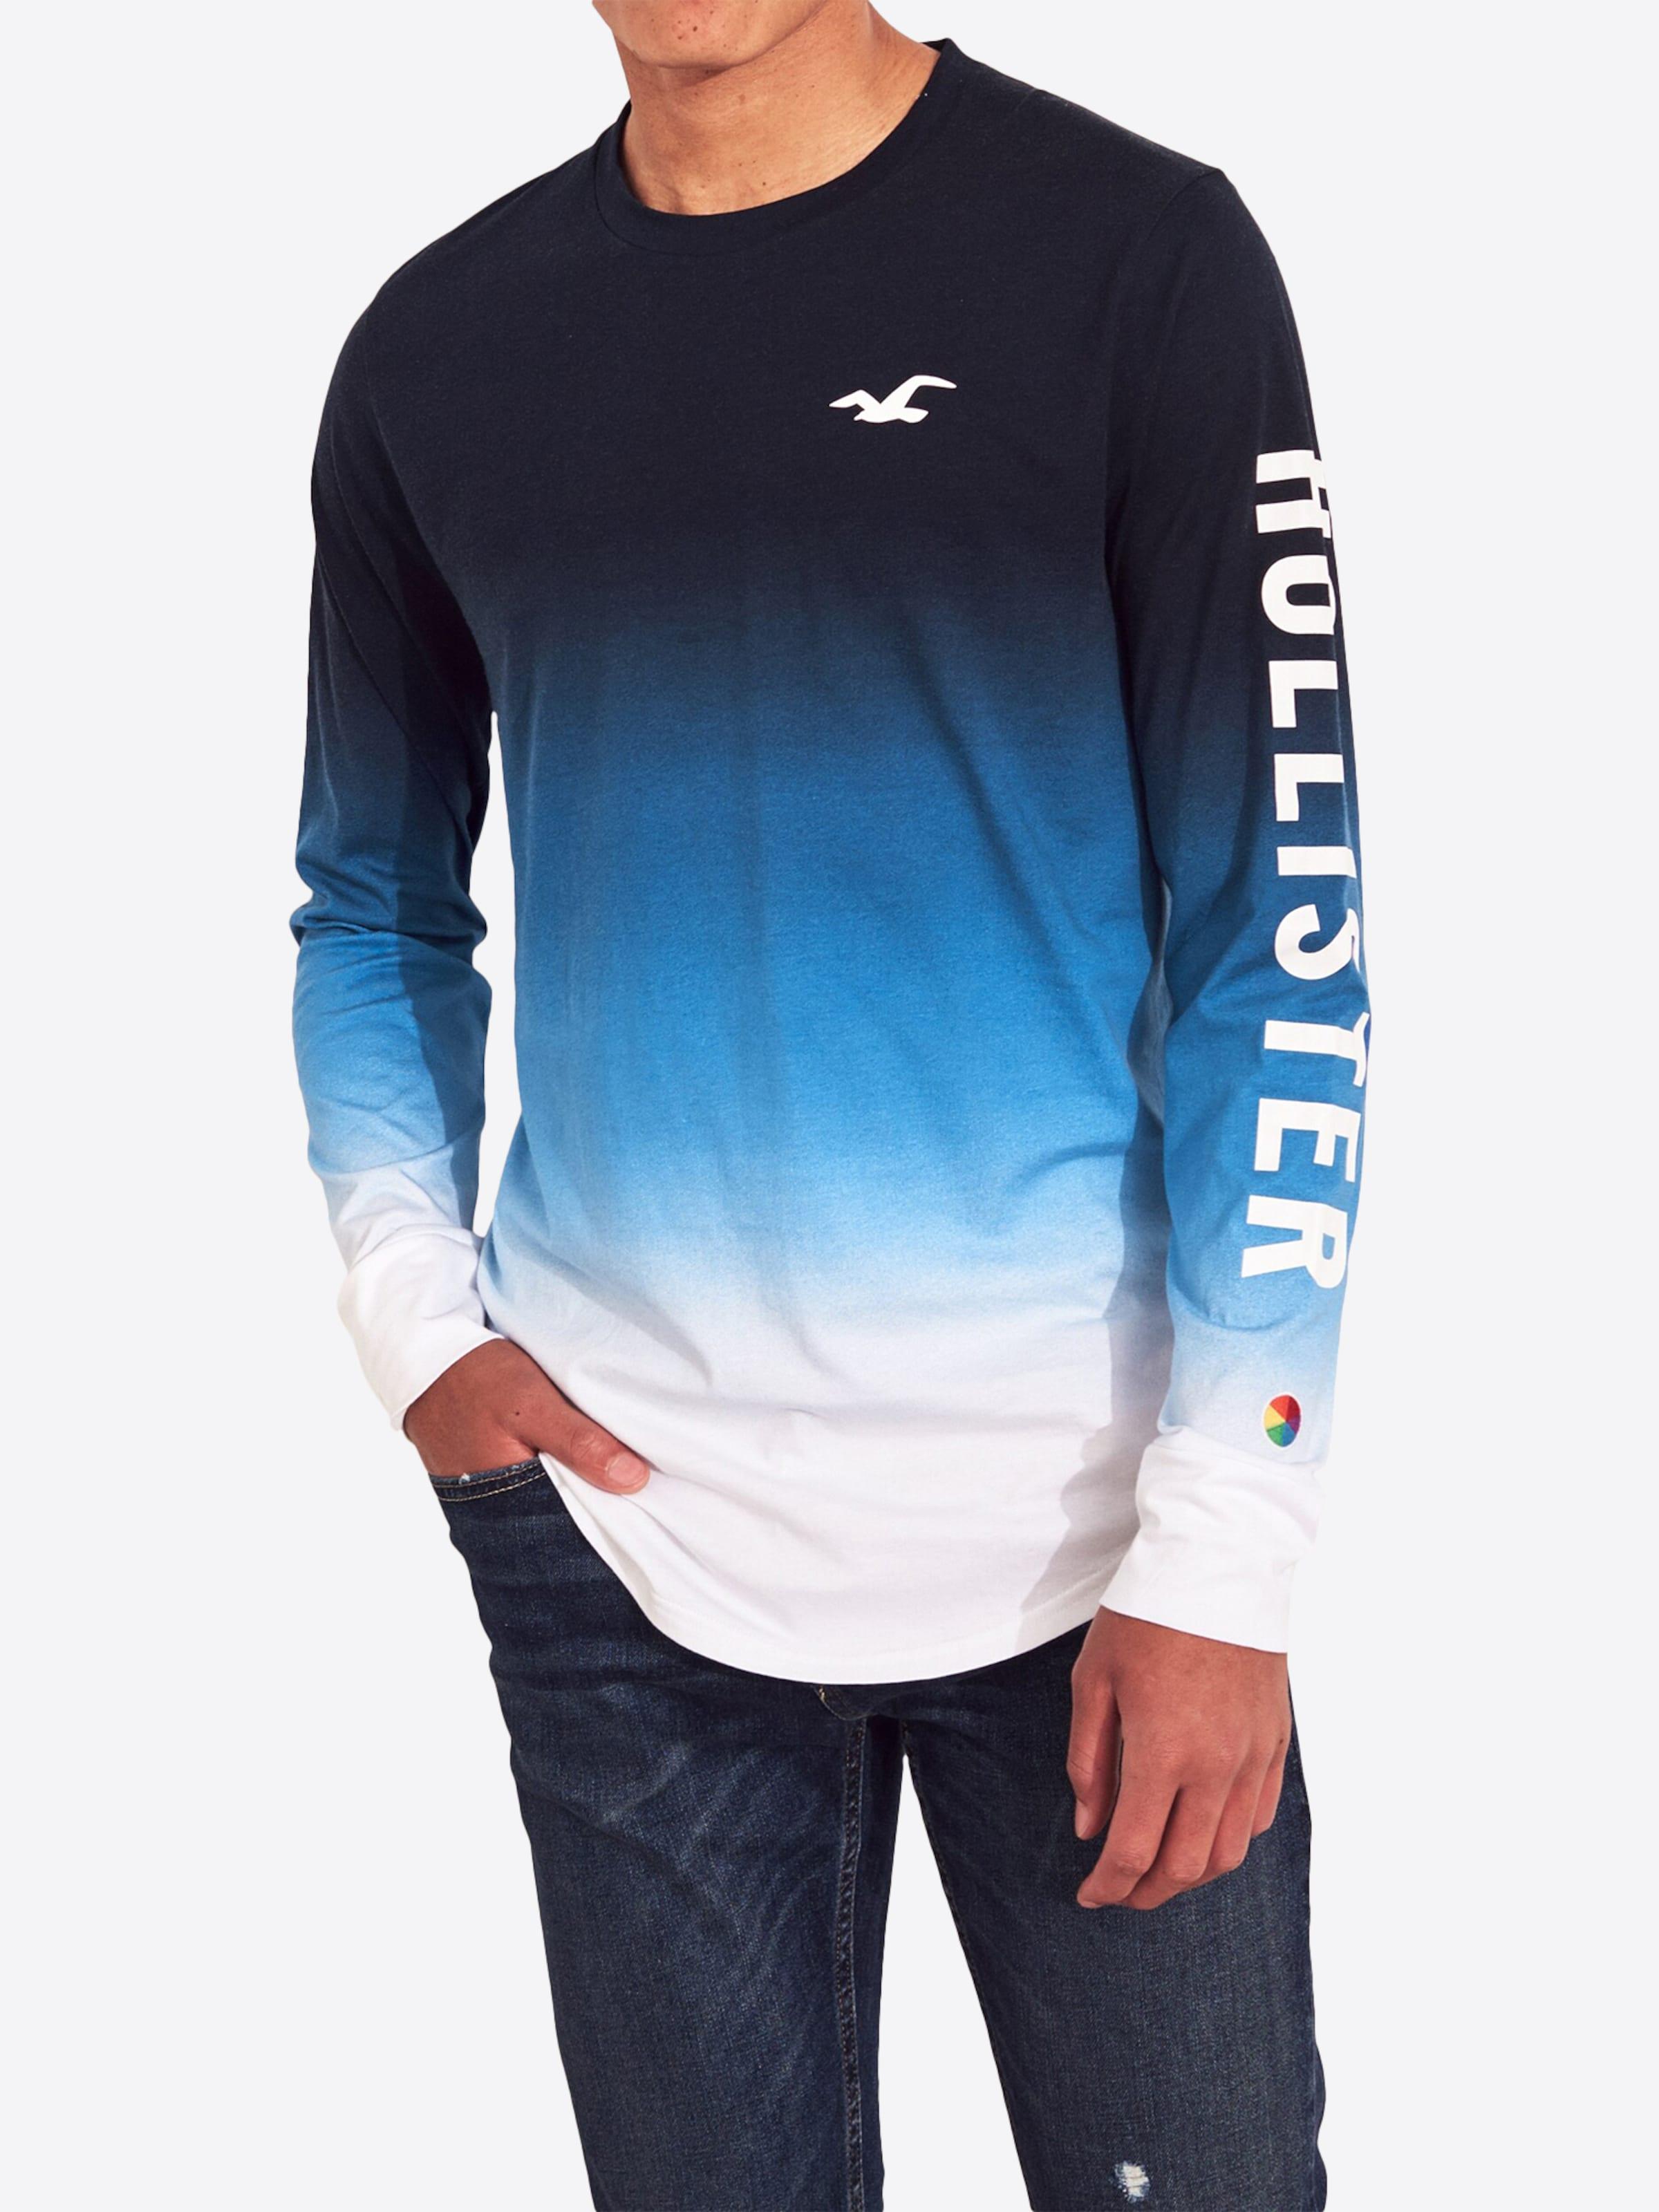 DunkelblauWeiß In DunkelblauWeiß Shirt In Shirt Hollister Hollister w8nOvy0mNP